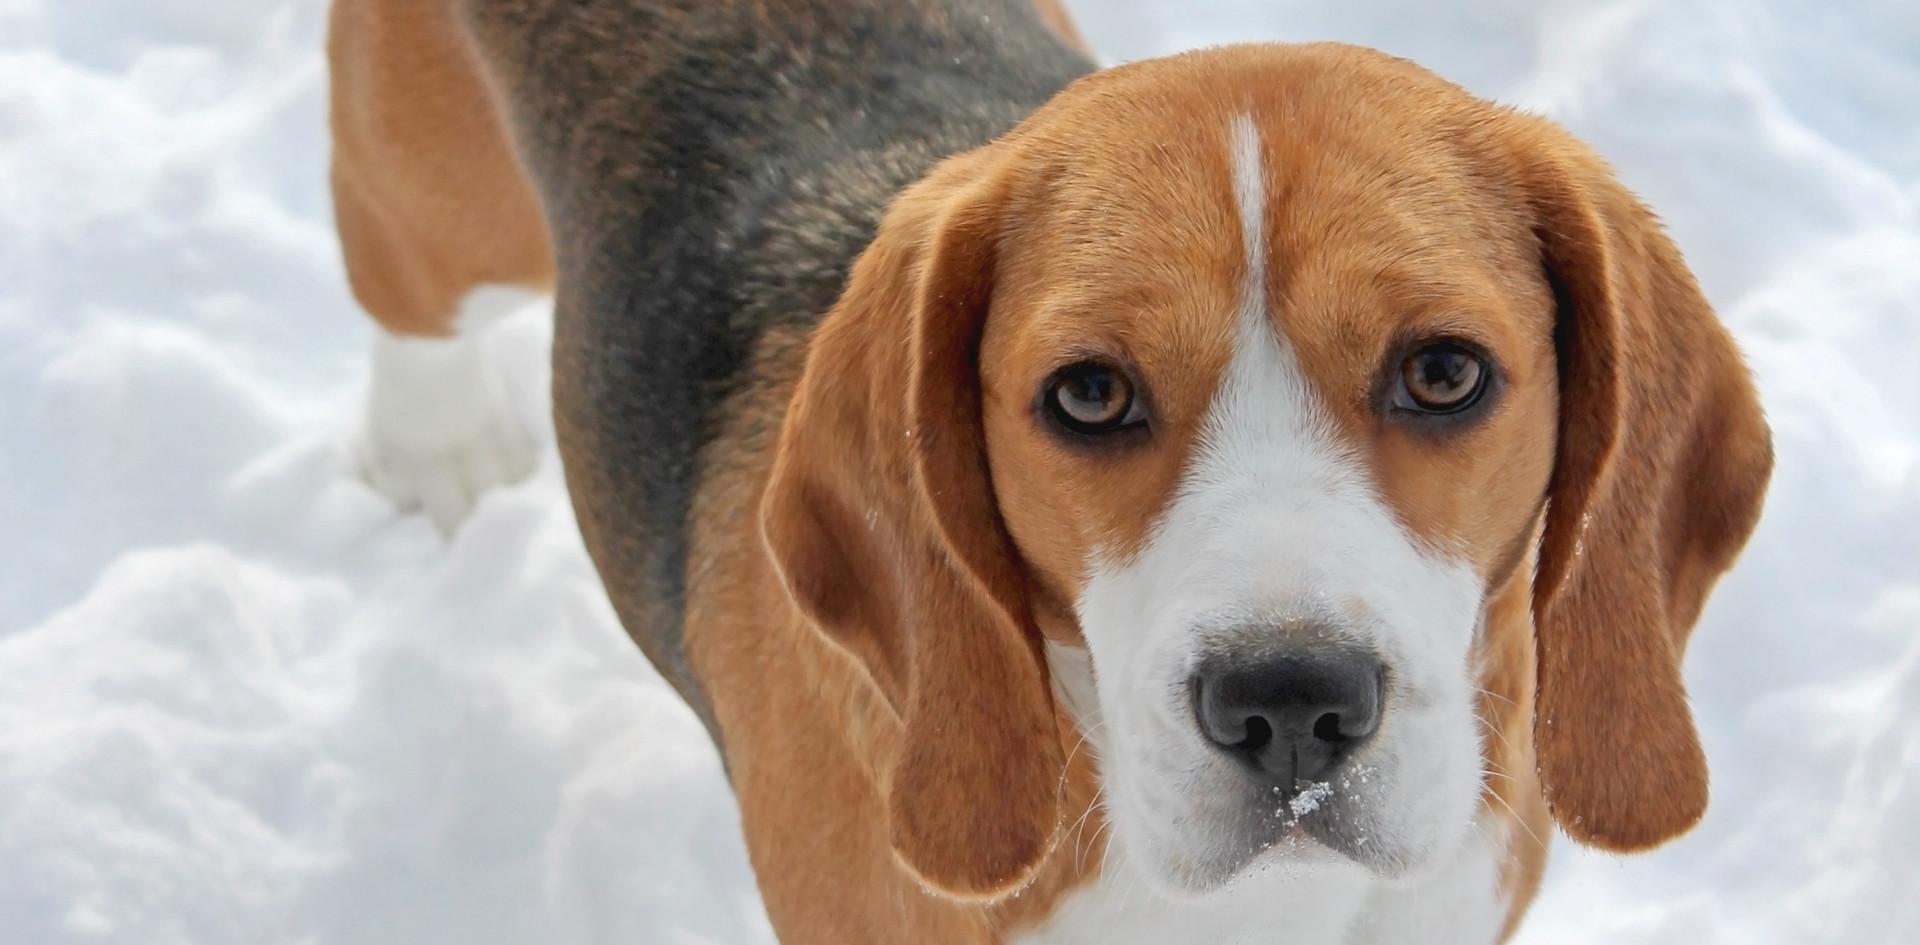 Female Beagle Clover in Snow